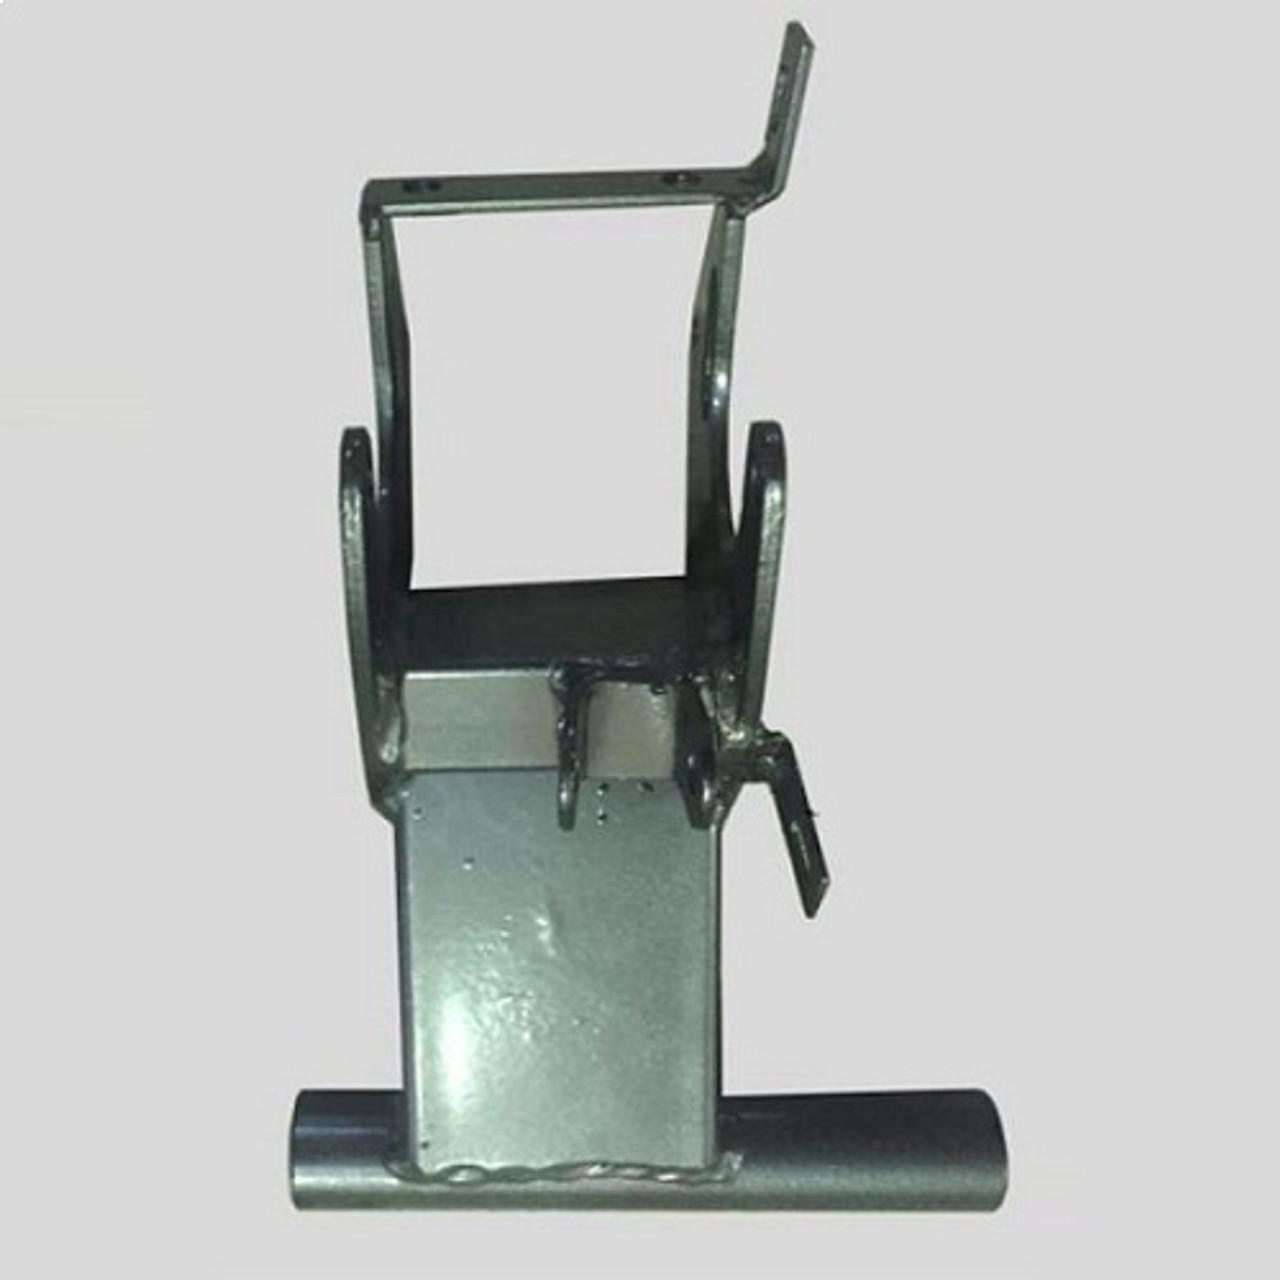 ATV Swing Arm for ATA 110 B/B1 109822